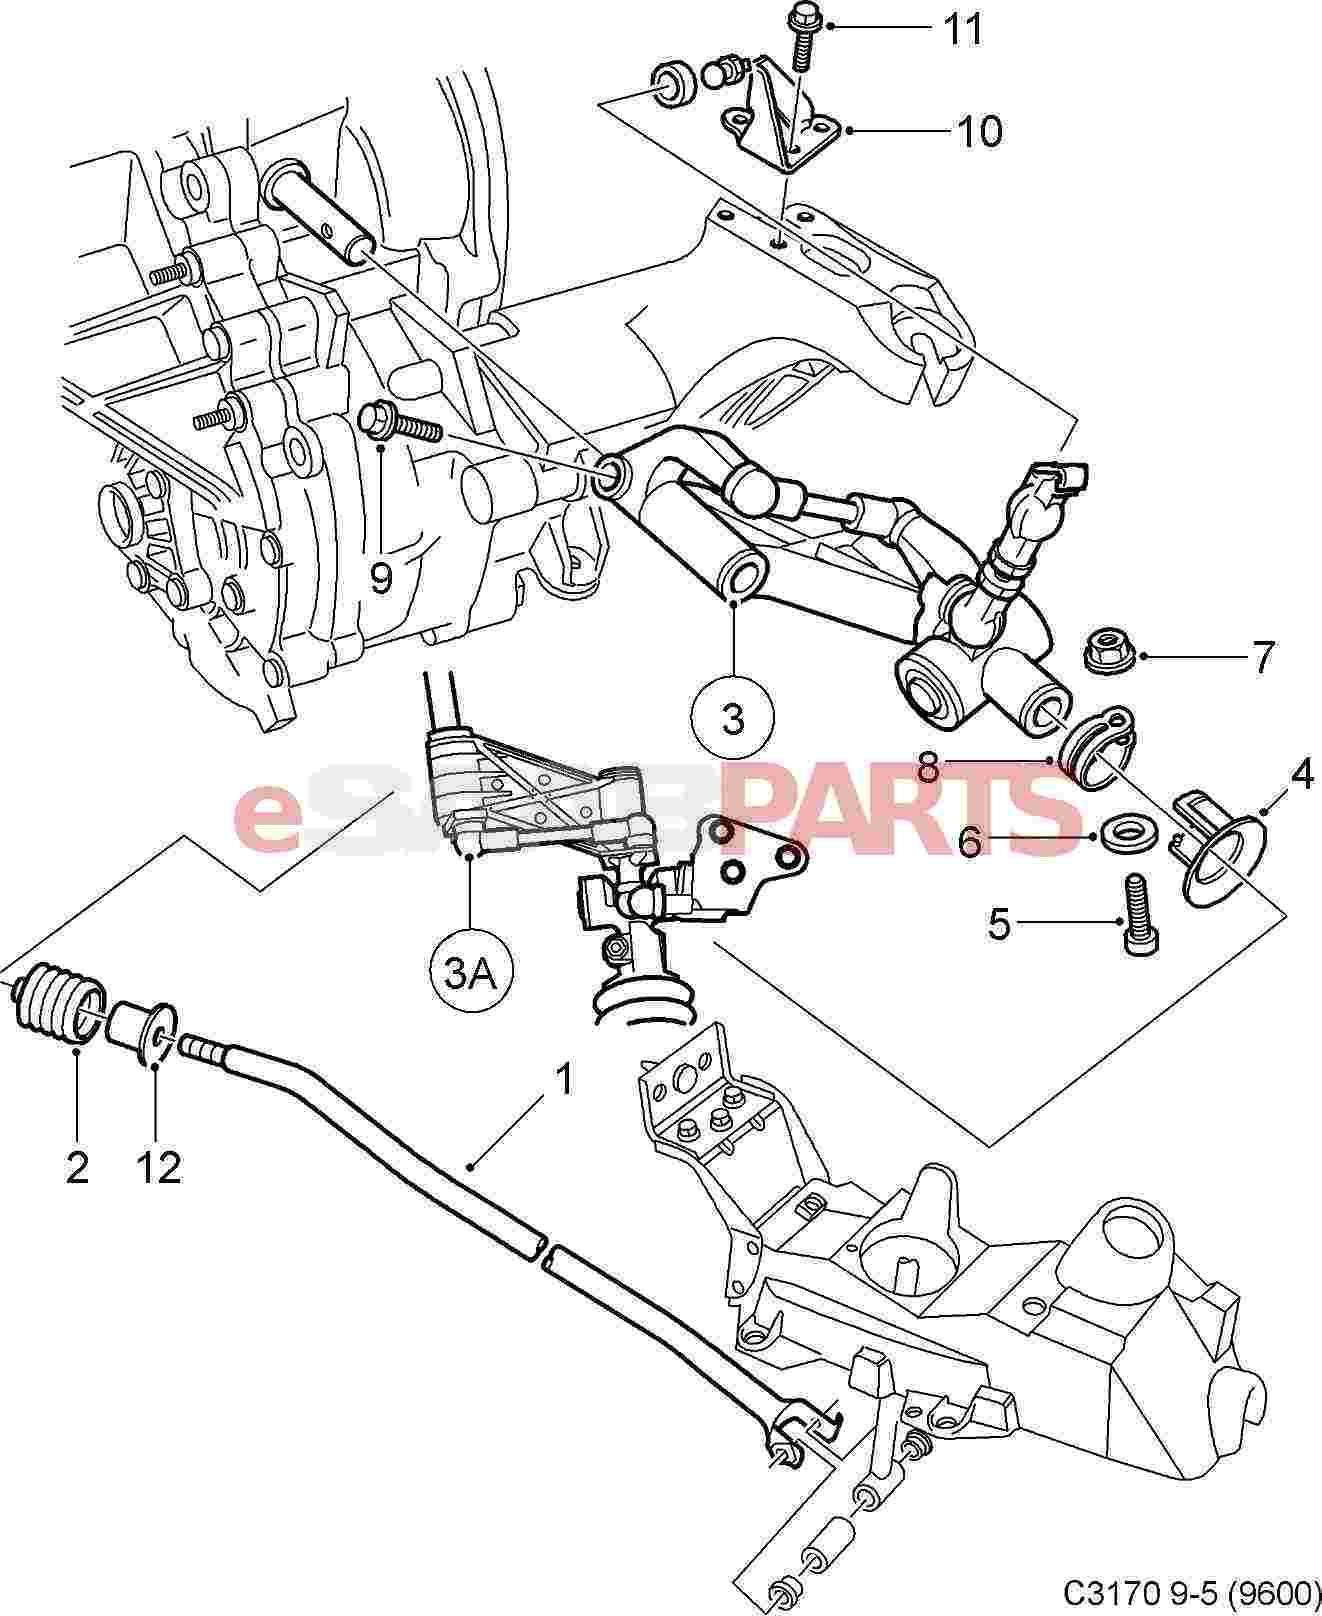 Saab 9 5 Parts Diagram • Wiring Diagram For Free